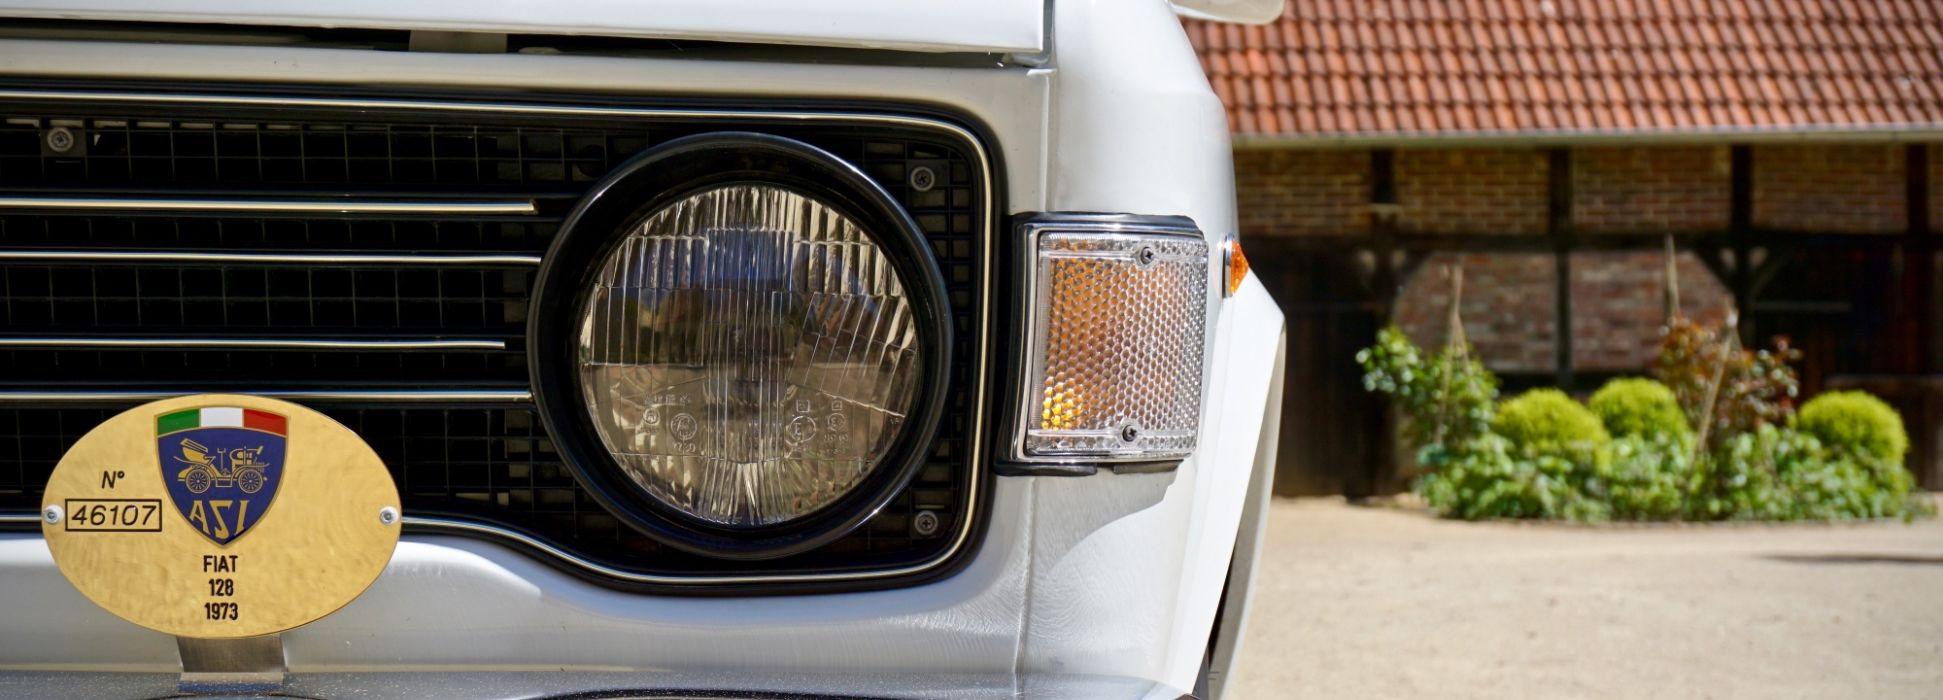 Fiat 128 Berlina 6